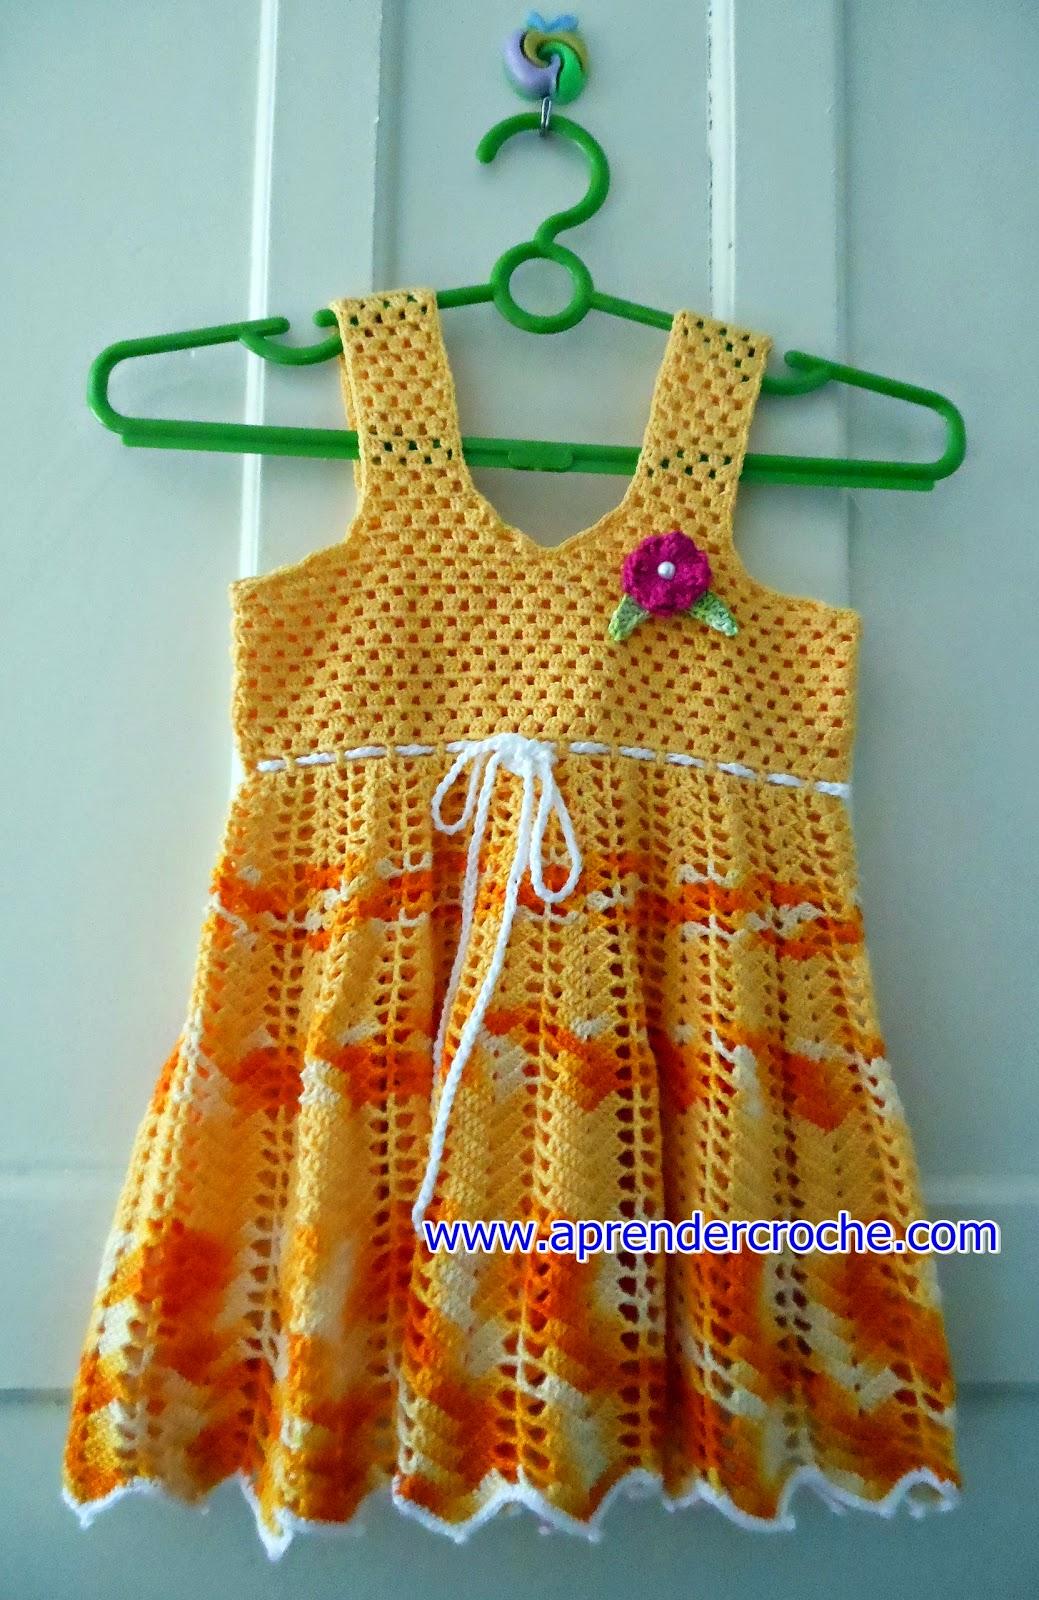 edinir ensina vestidinho de crochê